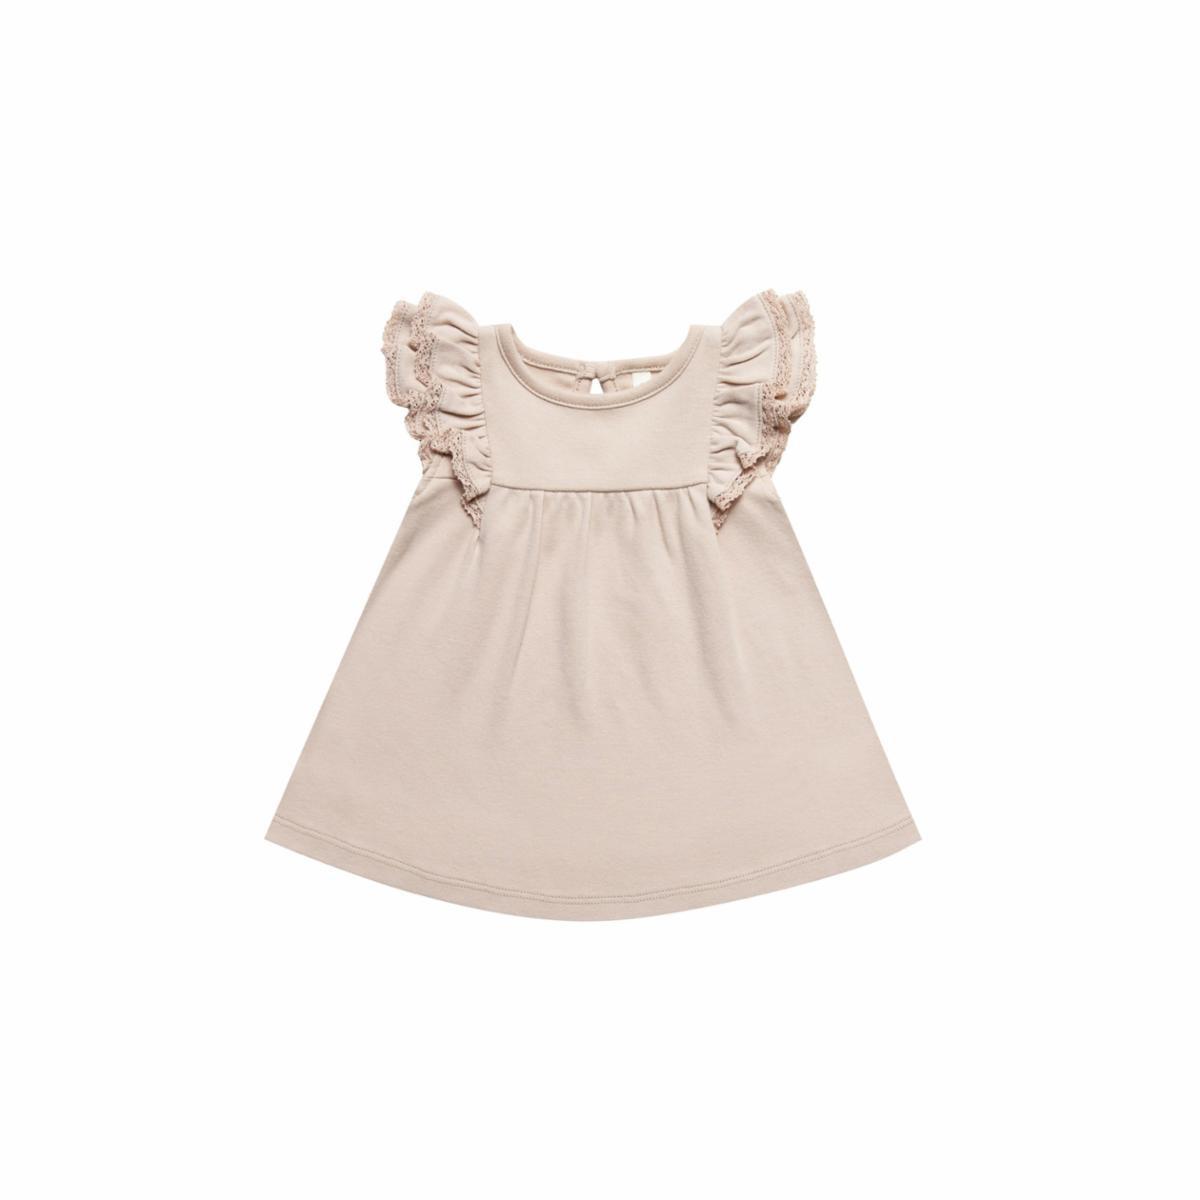 Quincy Mae Quincy Mae - Flutter Dress